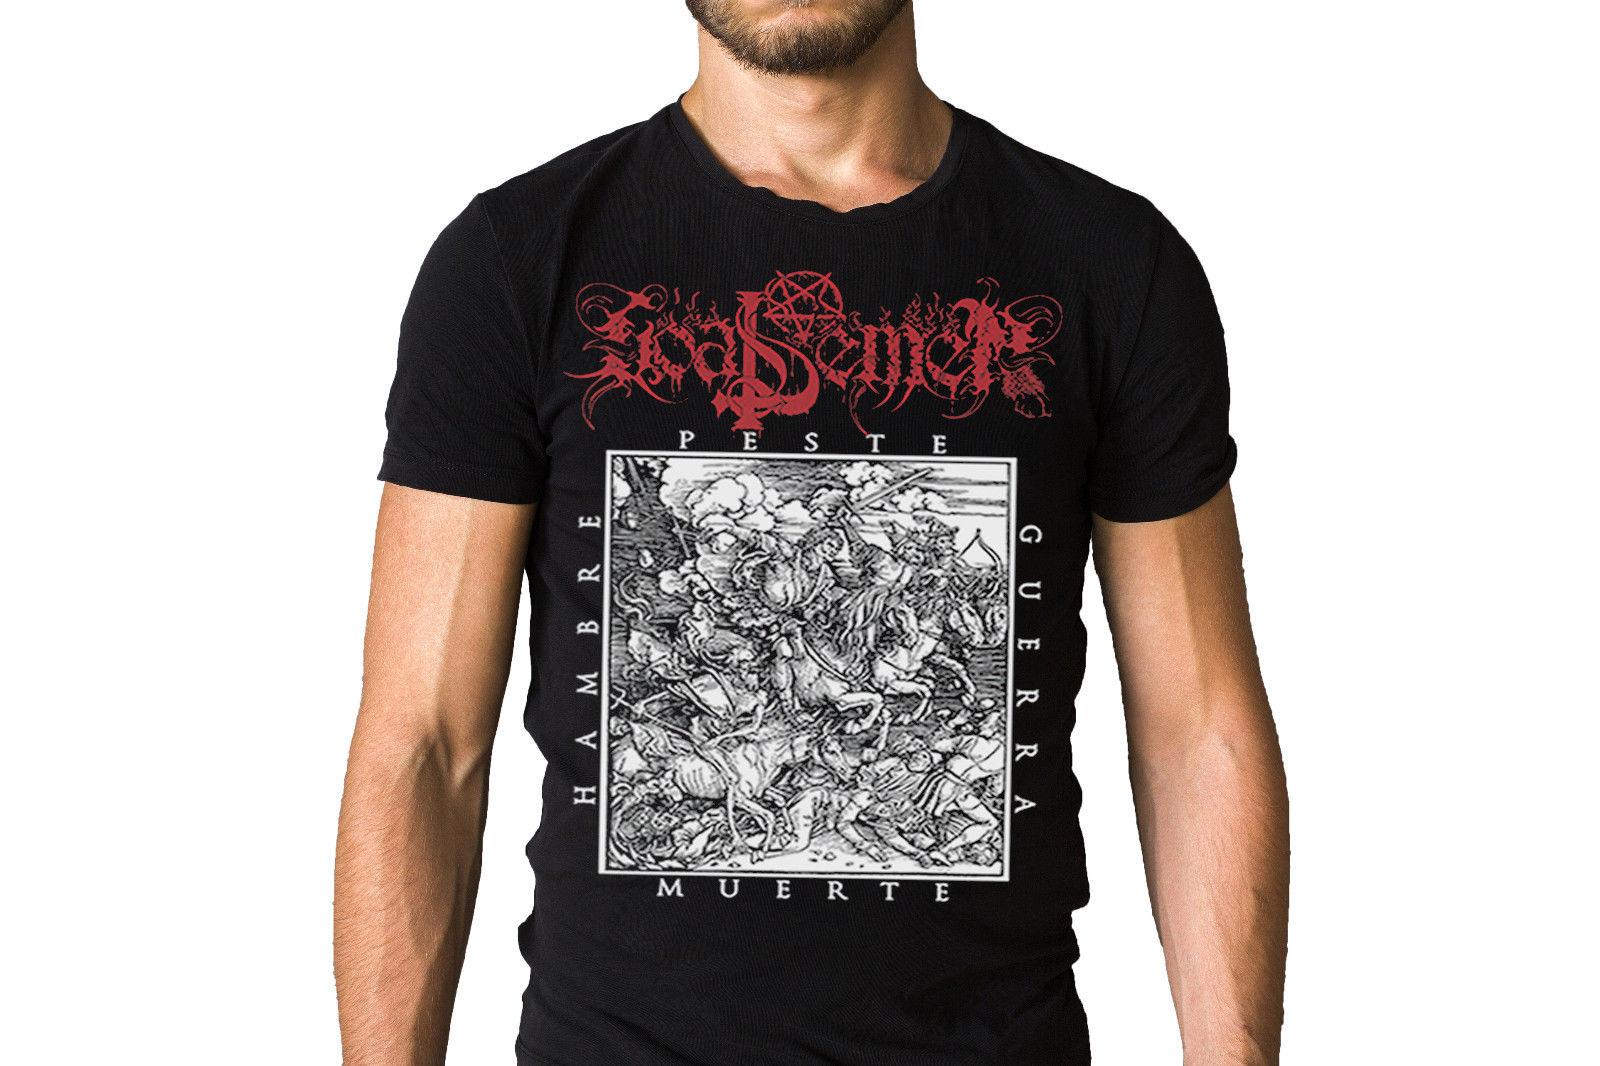 Goat Semen Hambre Peste Y Muerte Album Cover T-Shirt Funny Casual Brand Shirts Top